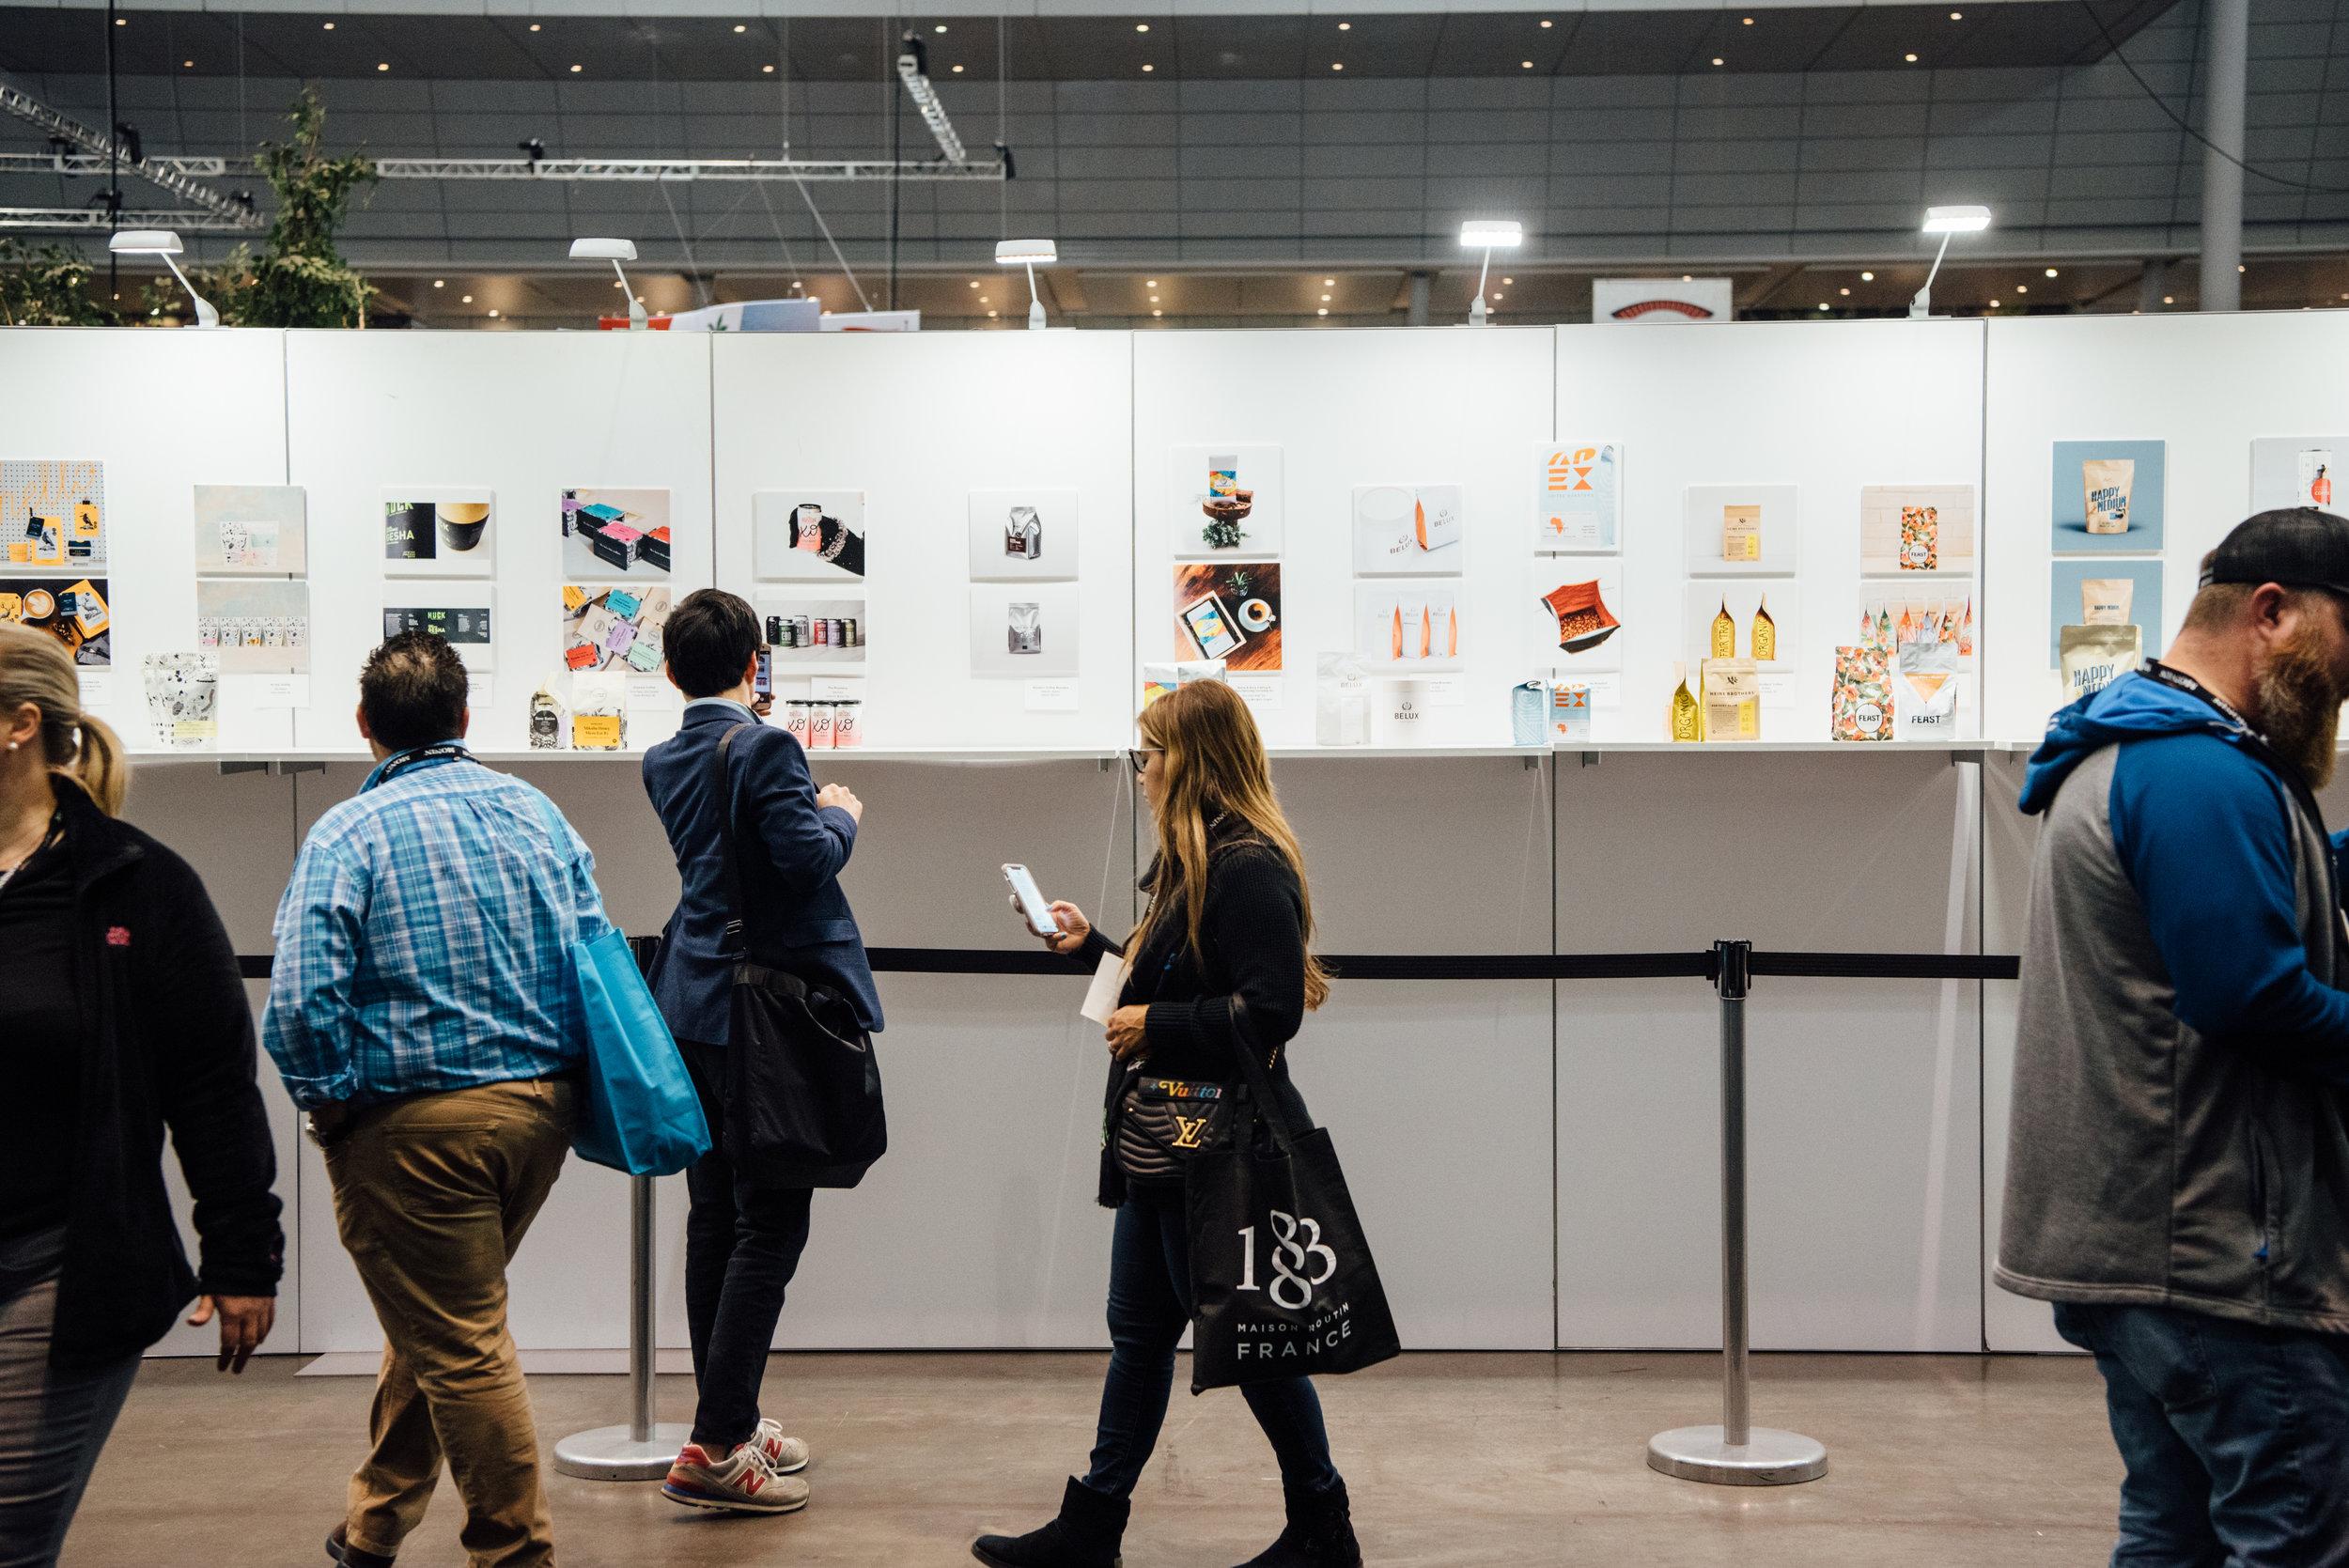 2019 DESIGN LAB WINNERS - Meet the winners of the 2019 Design Lab…